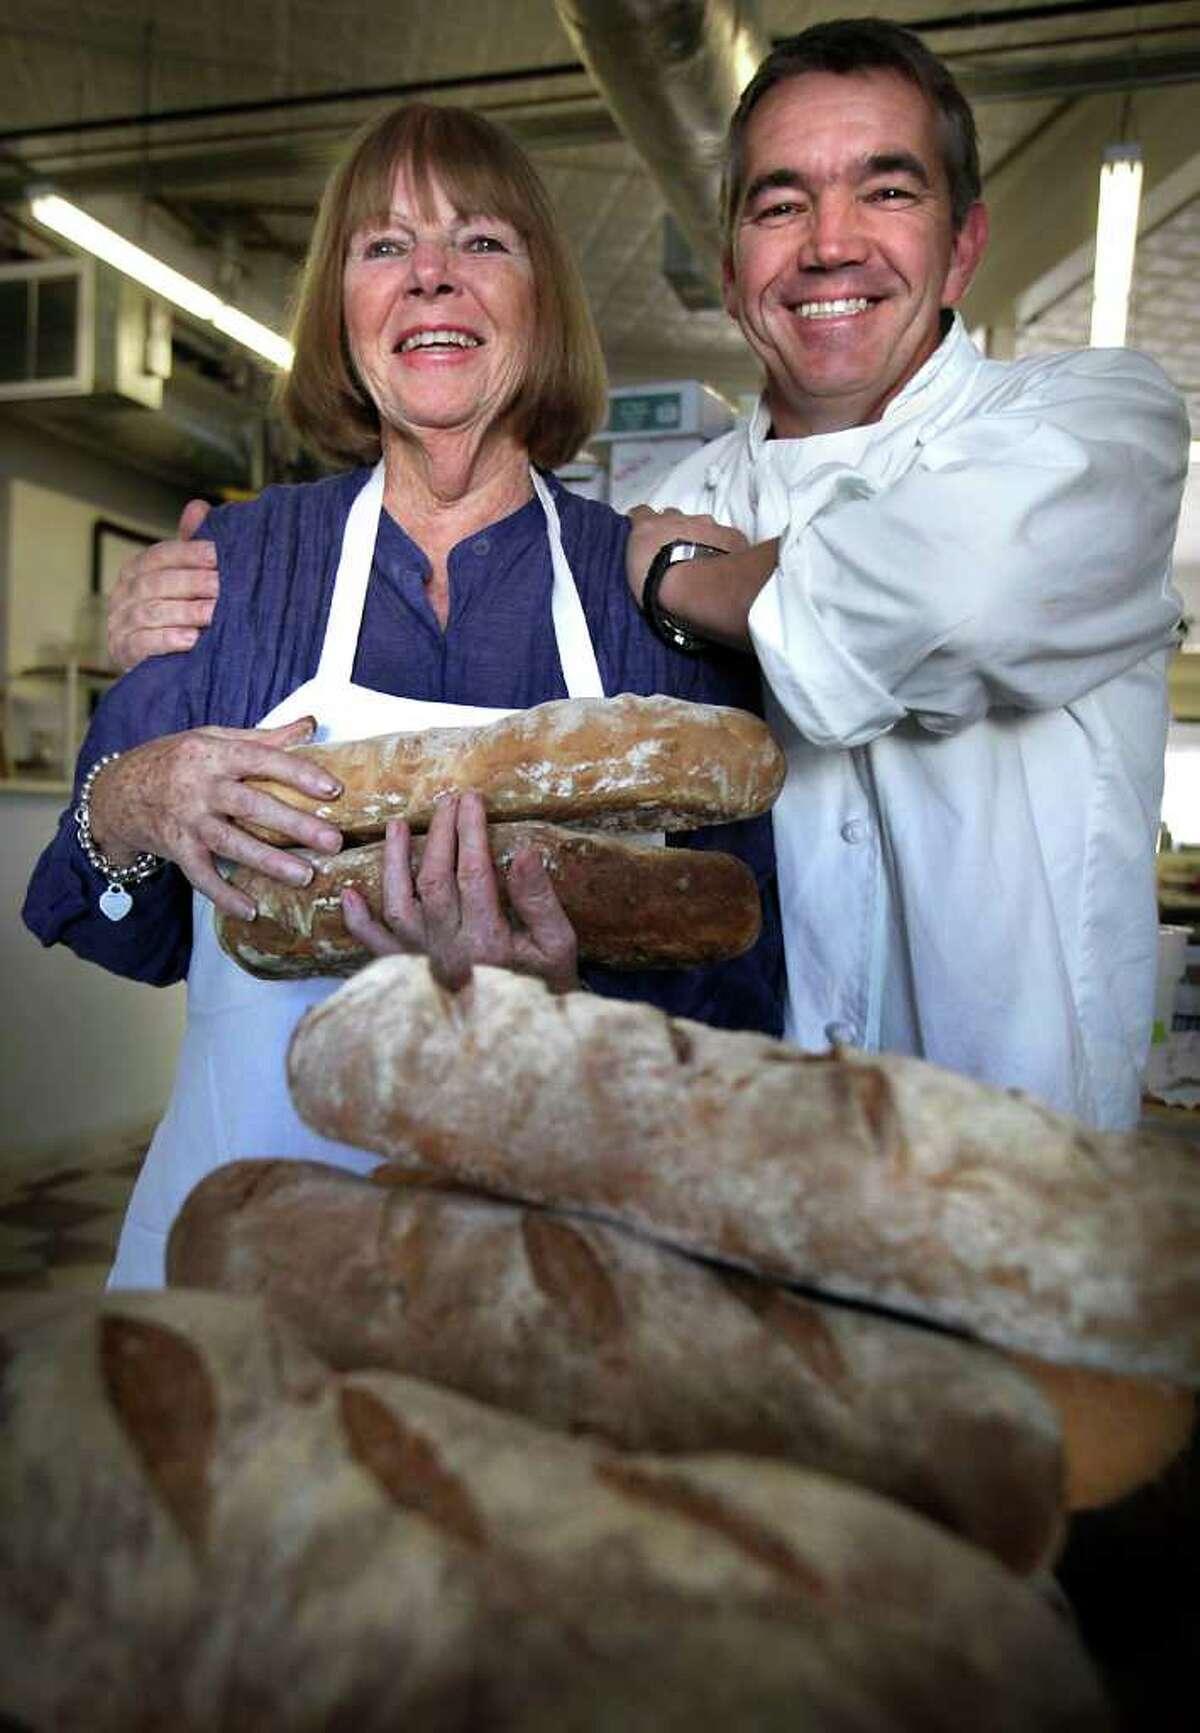 Damien Watel, owner of Bistro Vatel, and his mother Lucille Behey Watel, in her Bistro Bakery.